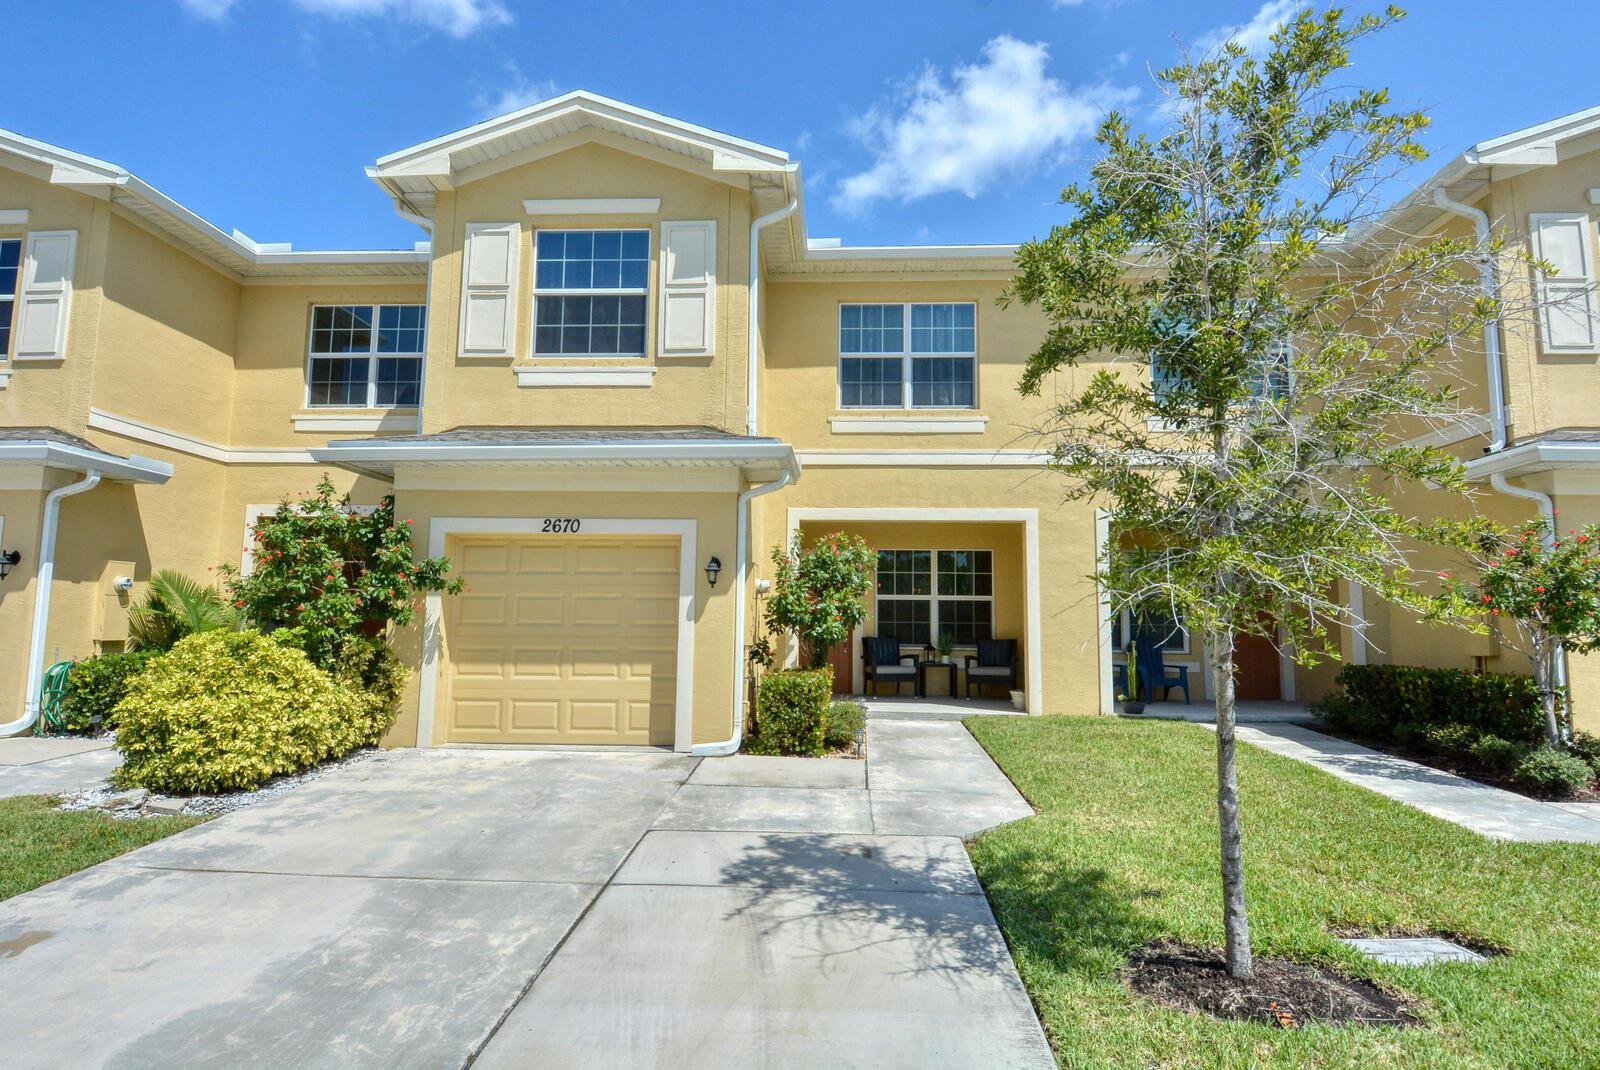 2670 NW Treviso Circle, Port Saint Lucie, FL 34986 - MLS#: RX-10735303